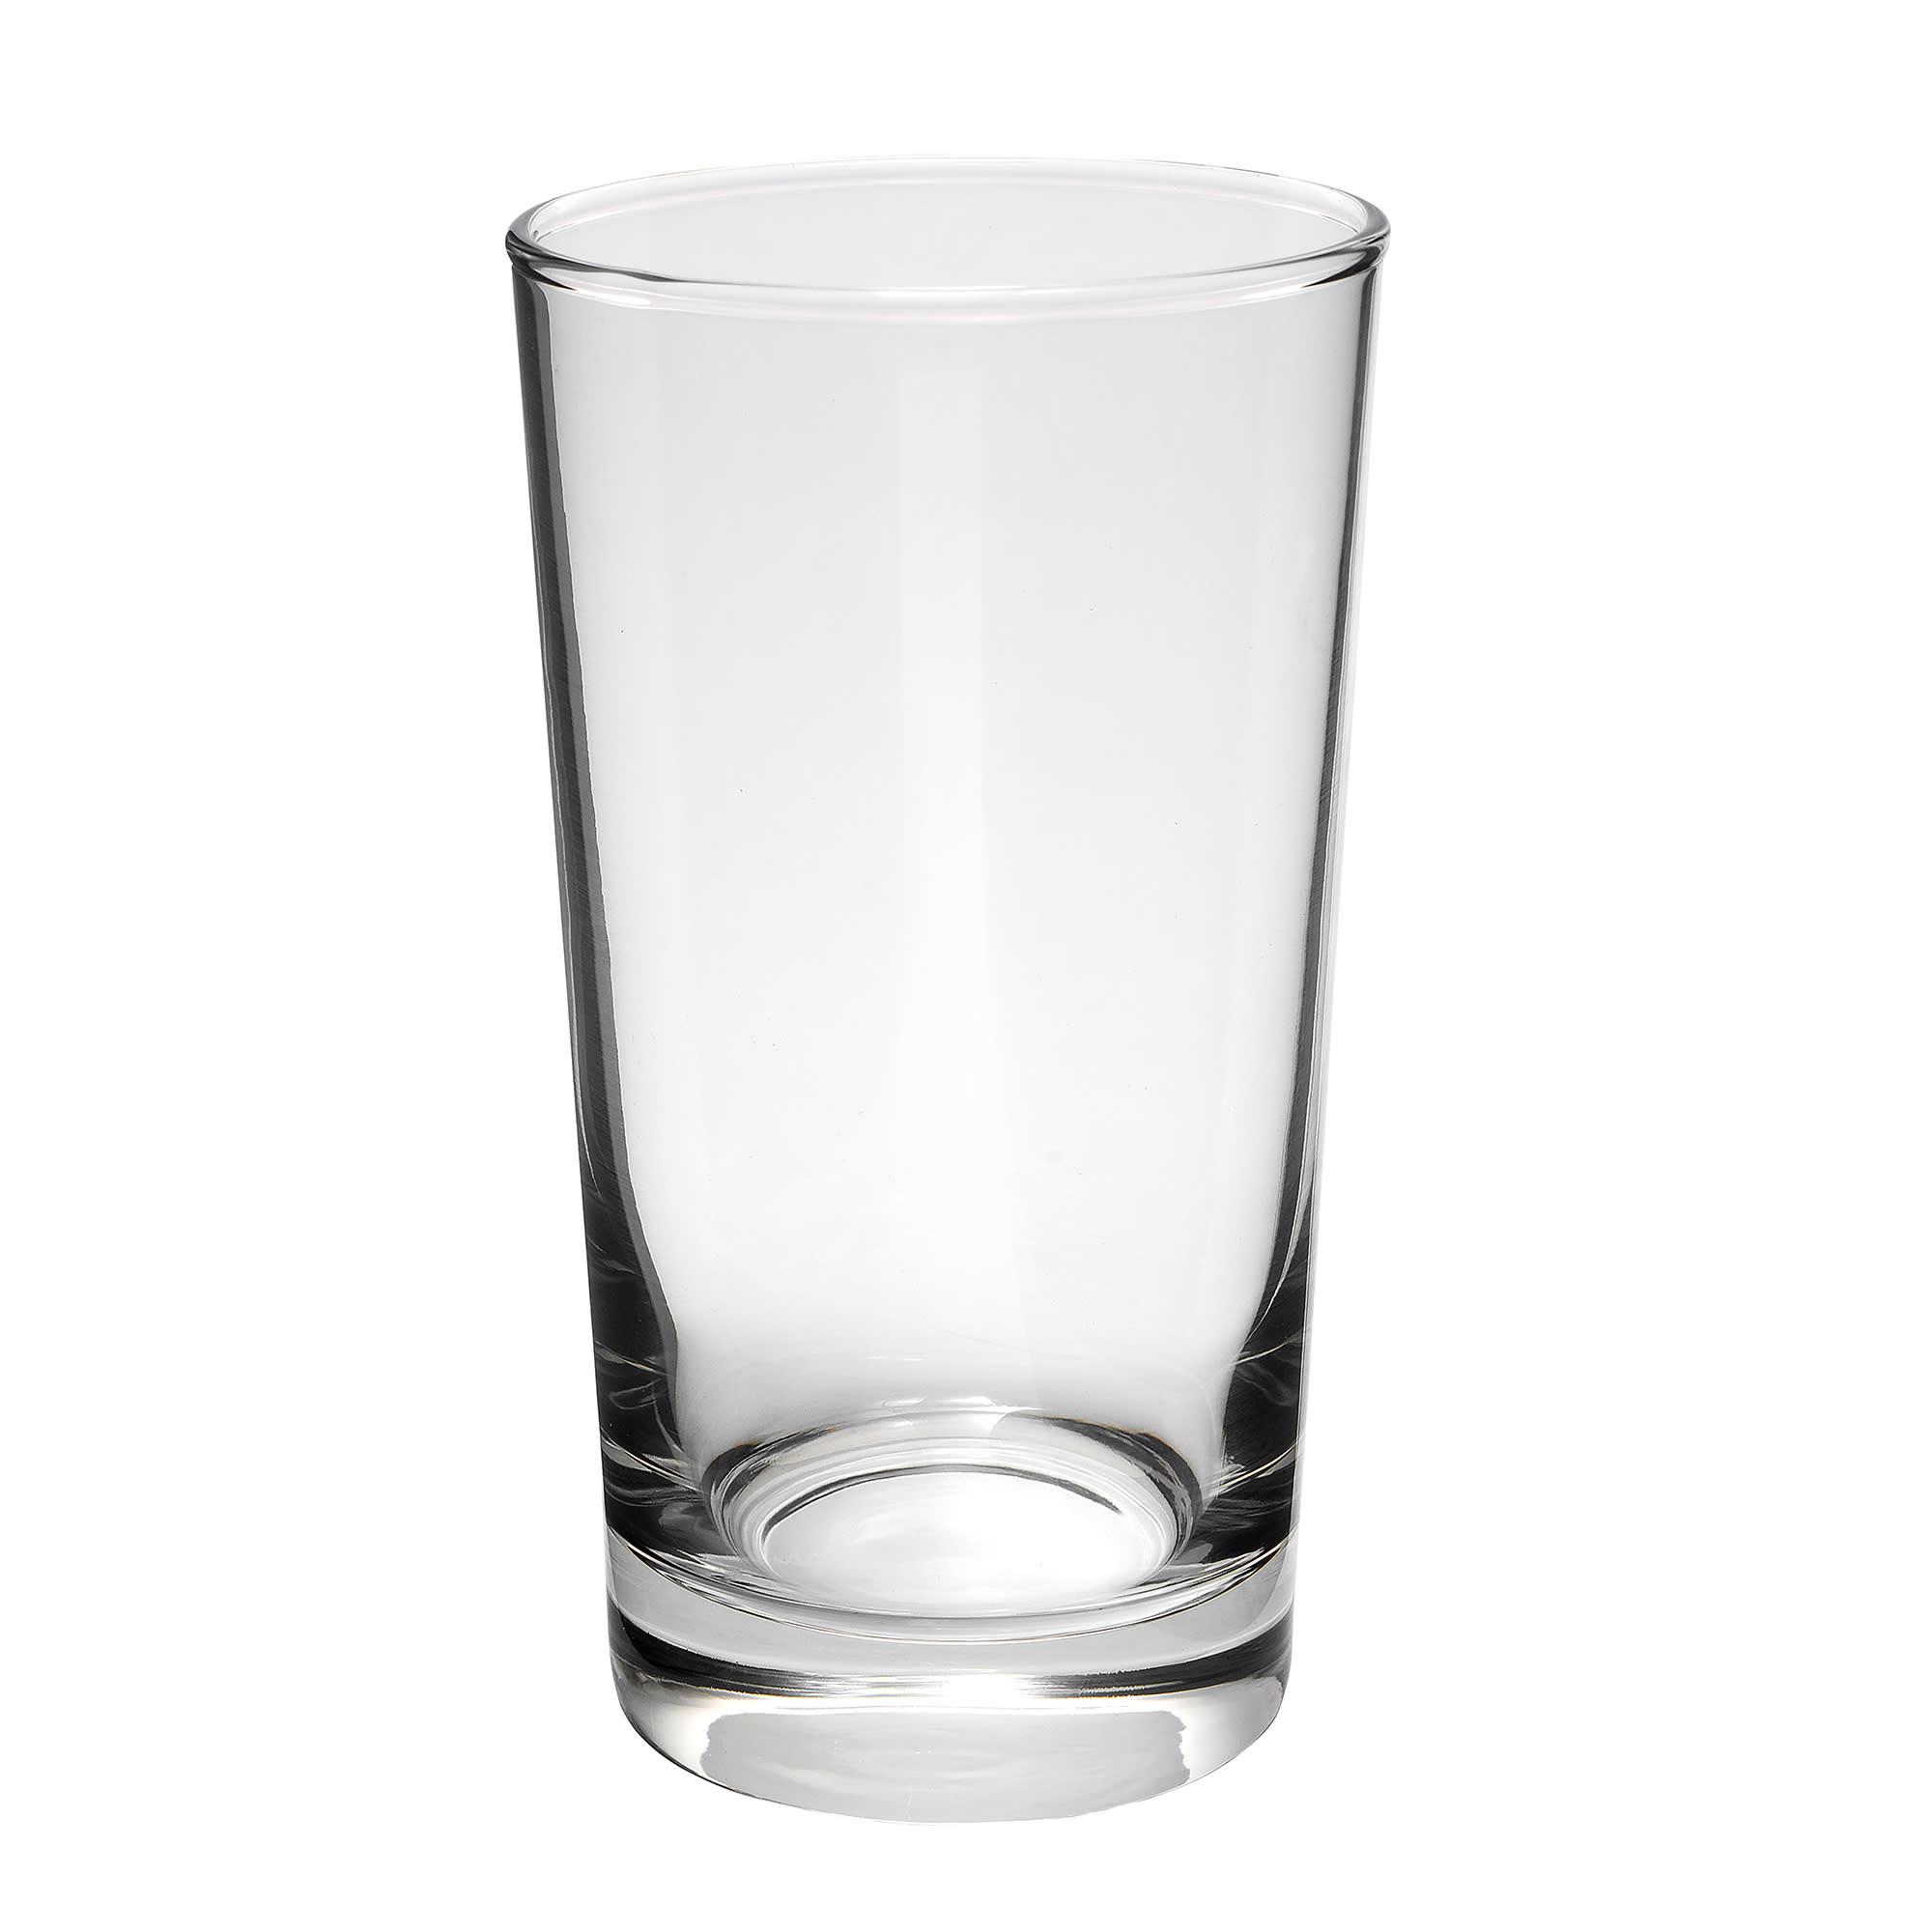 Libbey 172 10.75-oz Heavy Base Hi-Ball Glass - Safedge Rim Guarantee